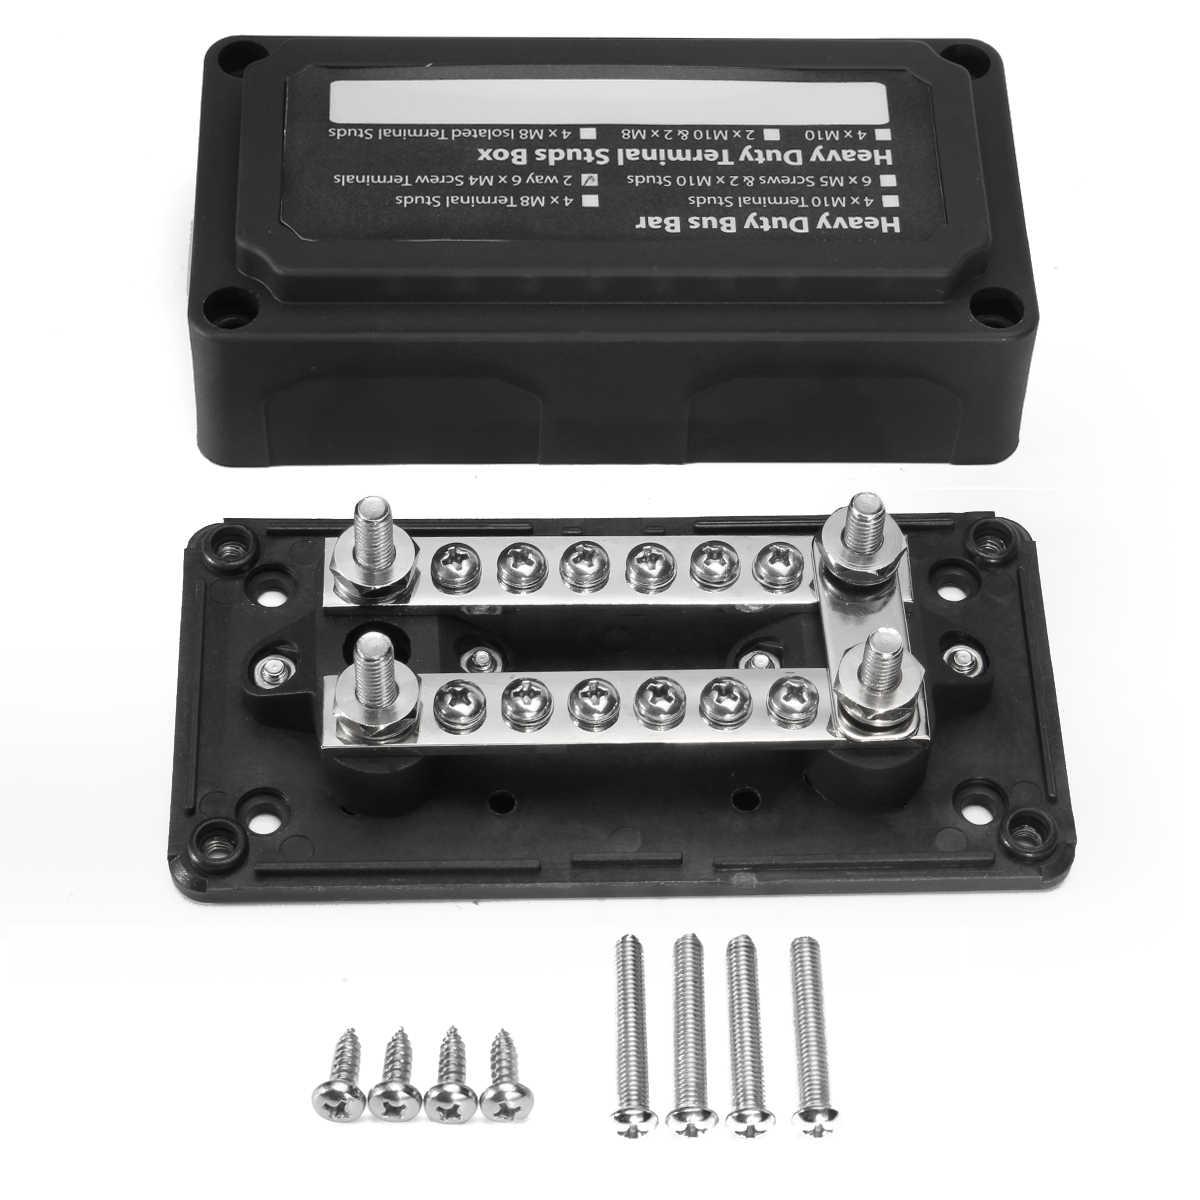 medium resolution of car blade fuse box block 48v heavy duty modular design dual bus bars with connecting